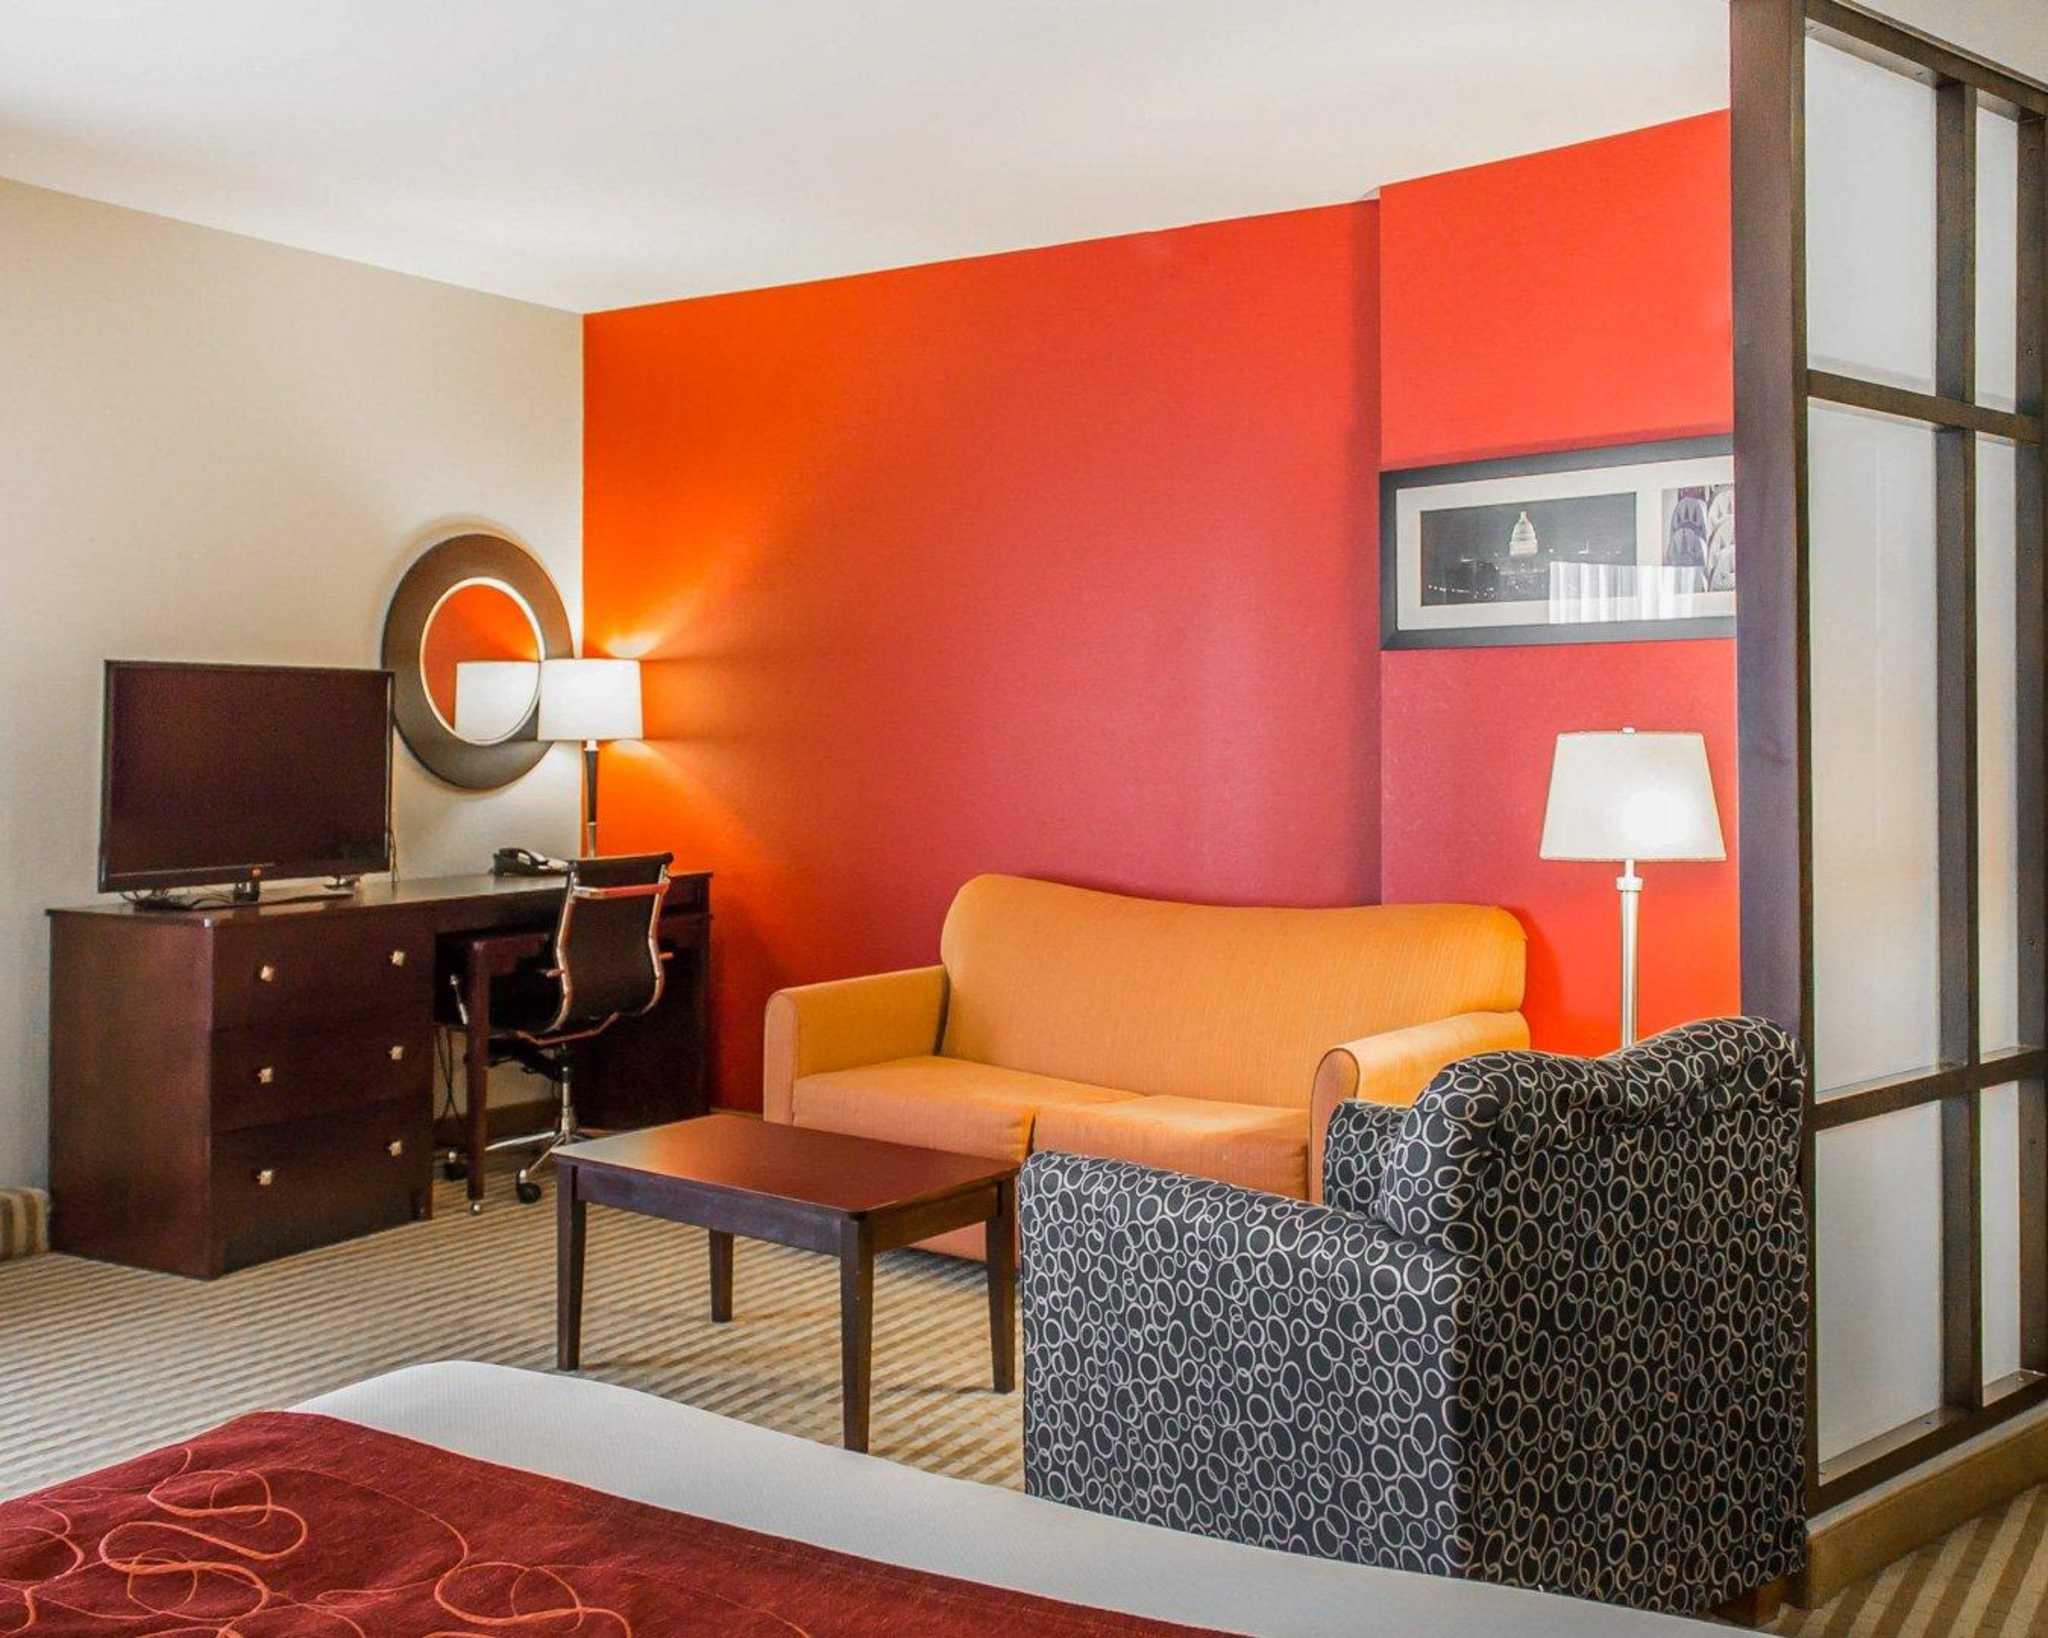 Comfort Suites East Broad at 270 image 4